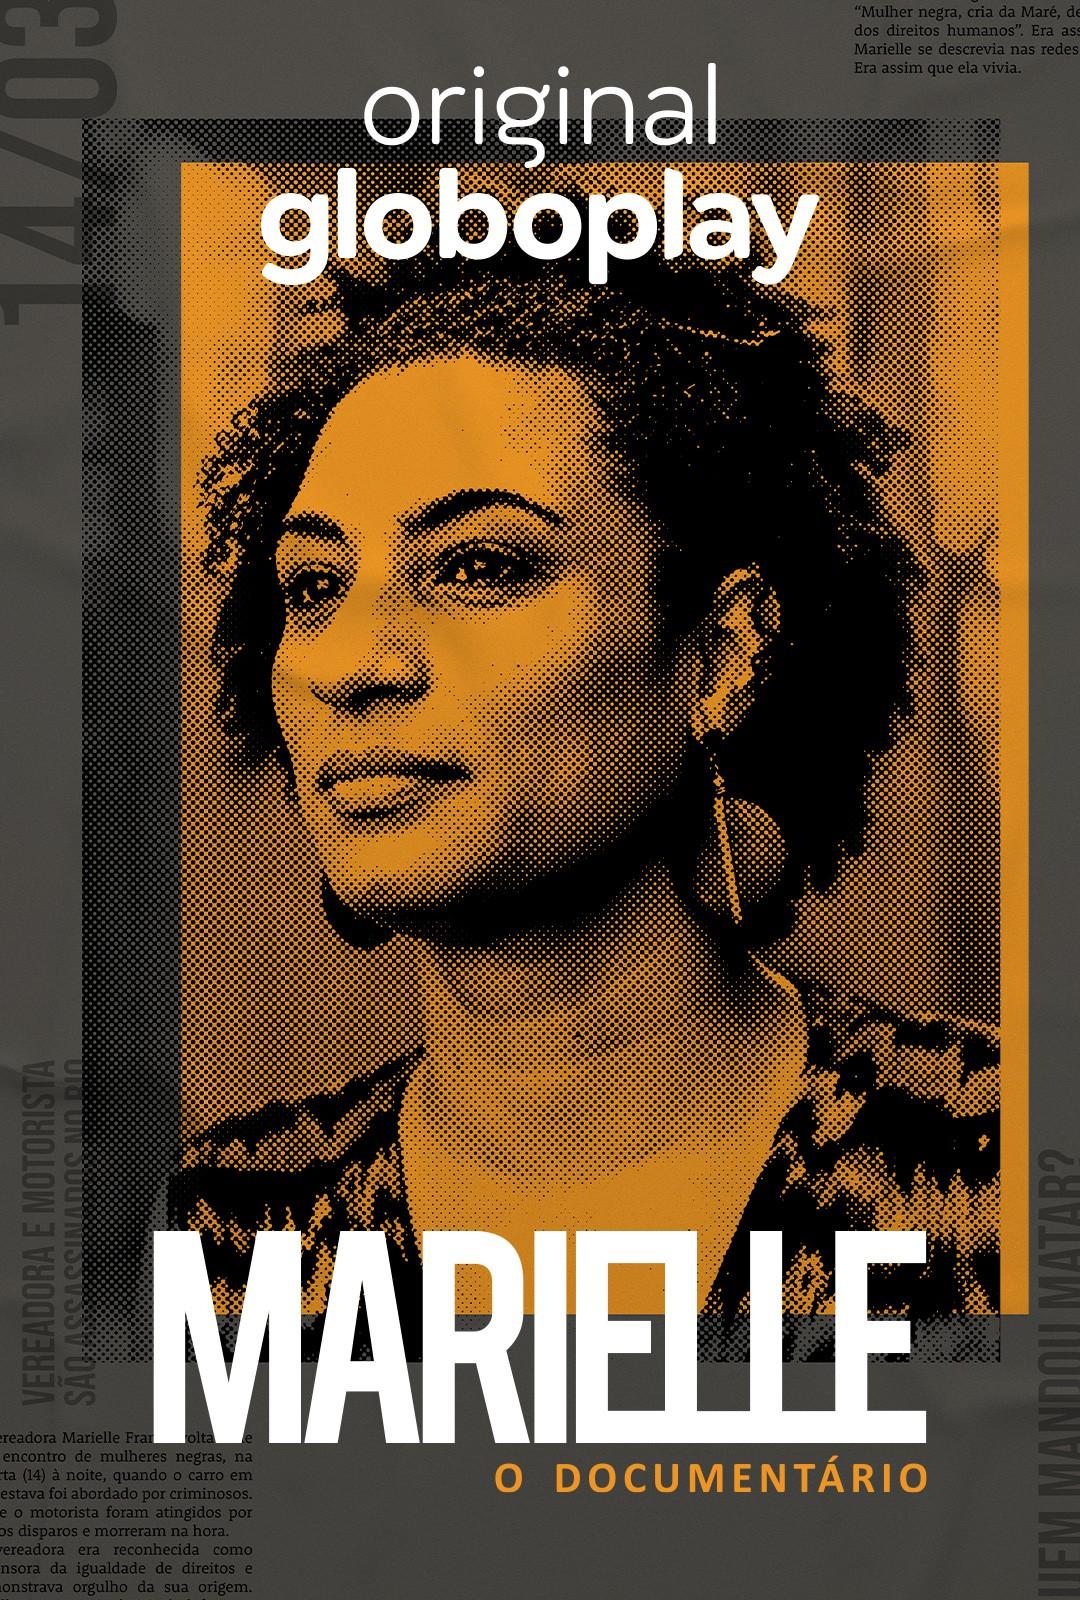 Marielle - O Documentário - Série 2020 - AdoroCinema